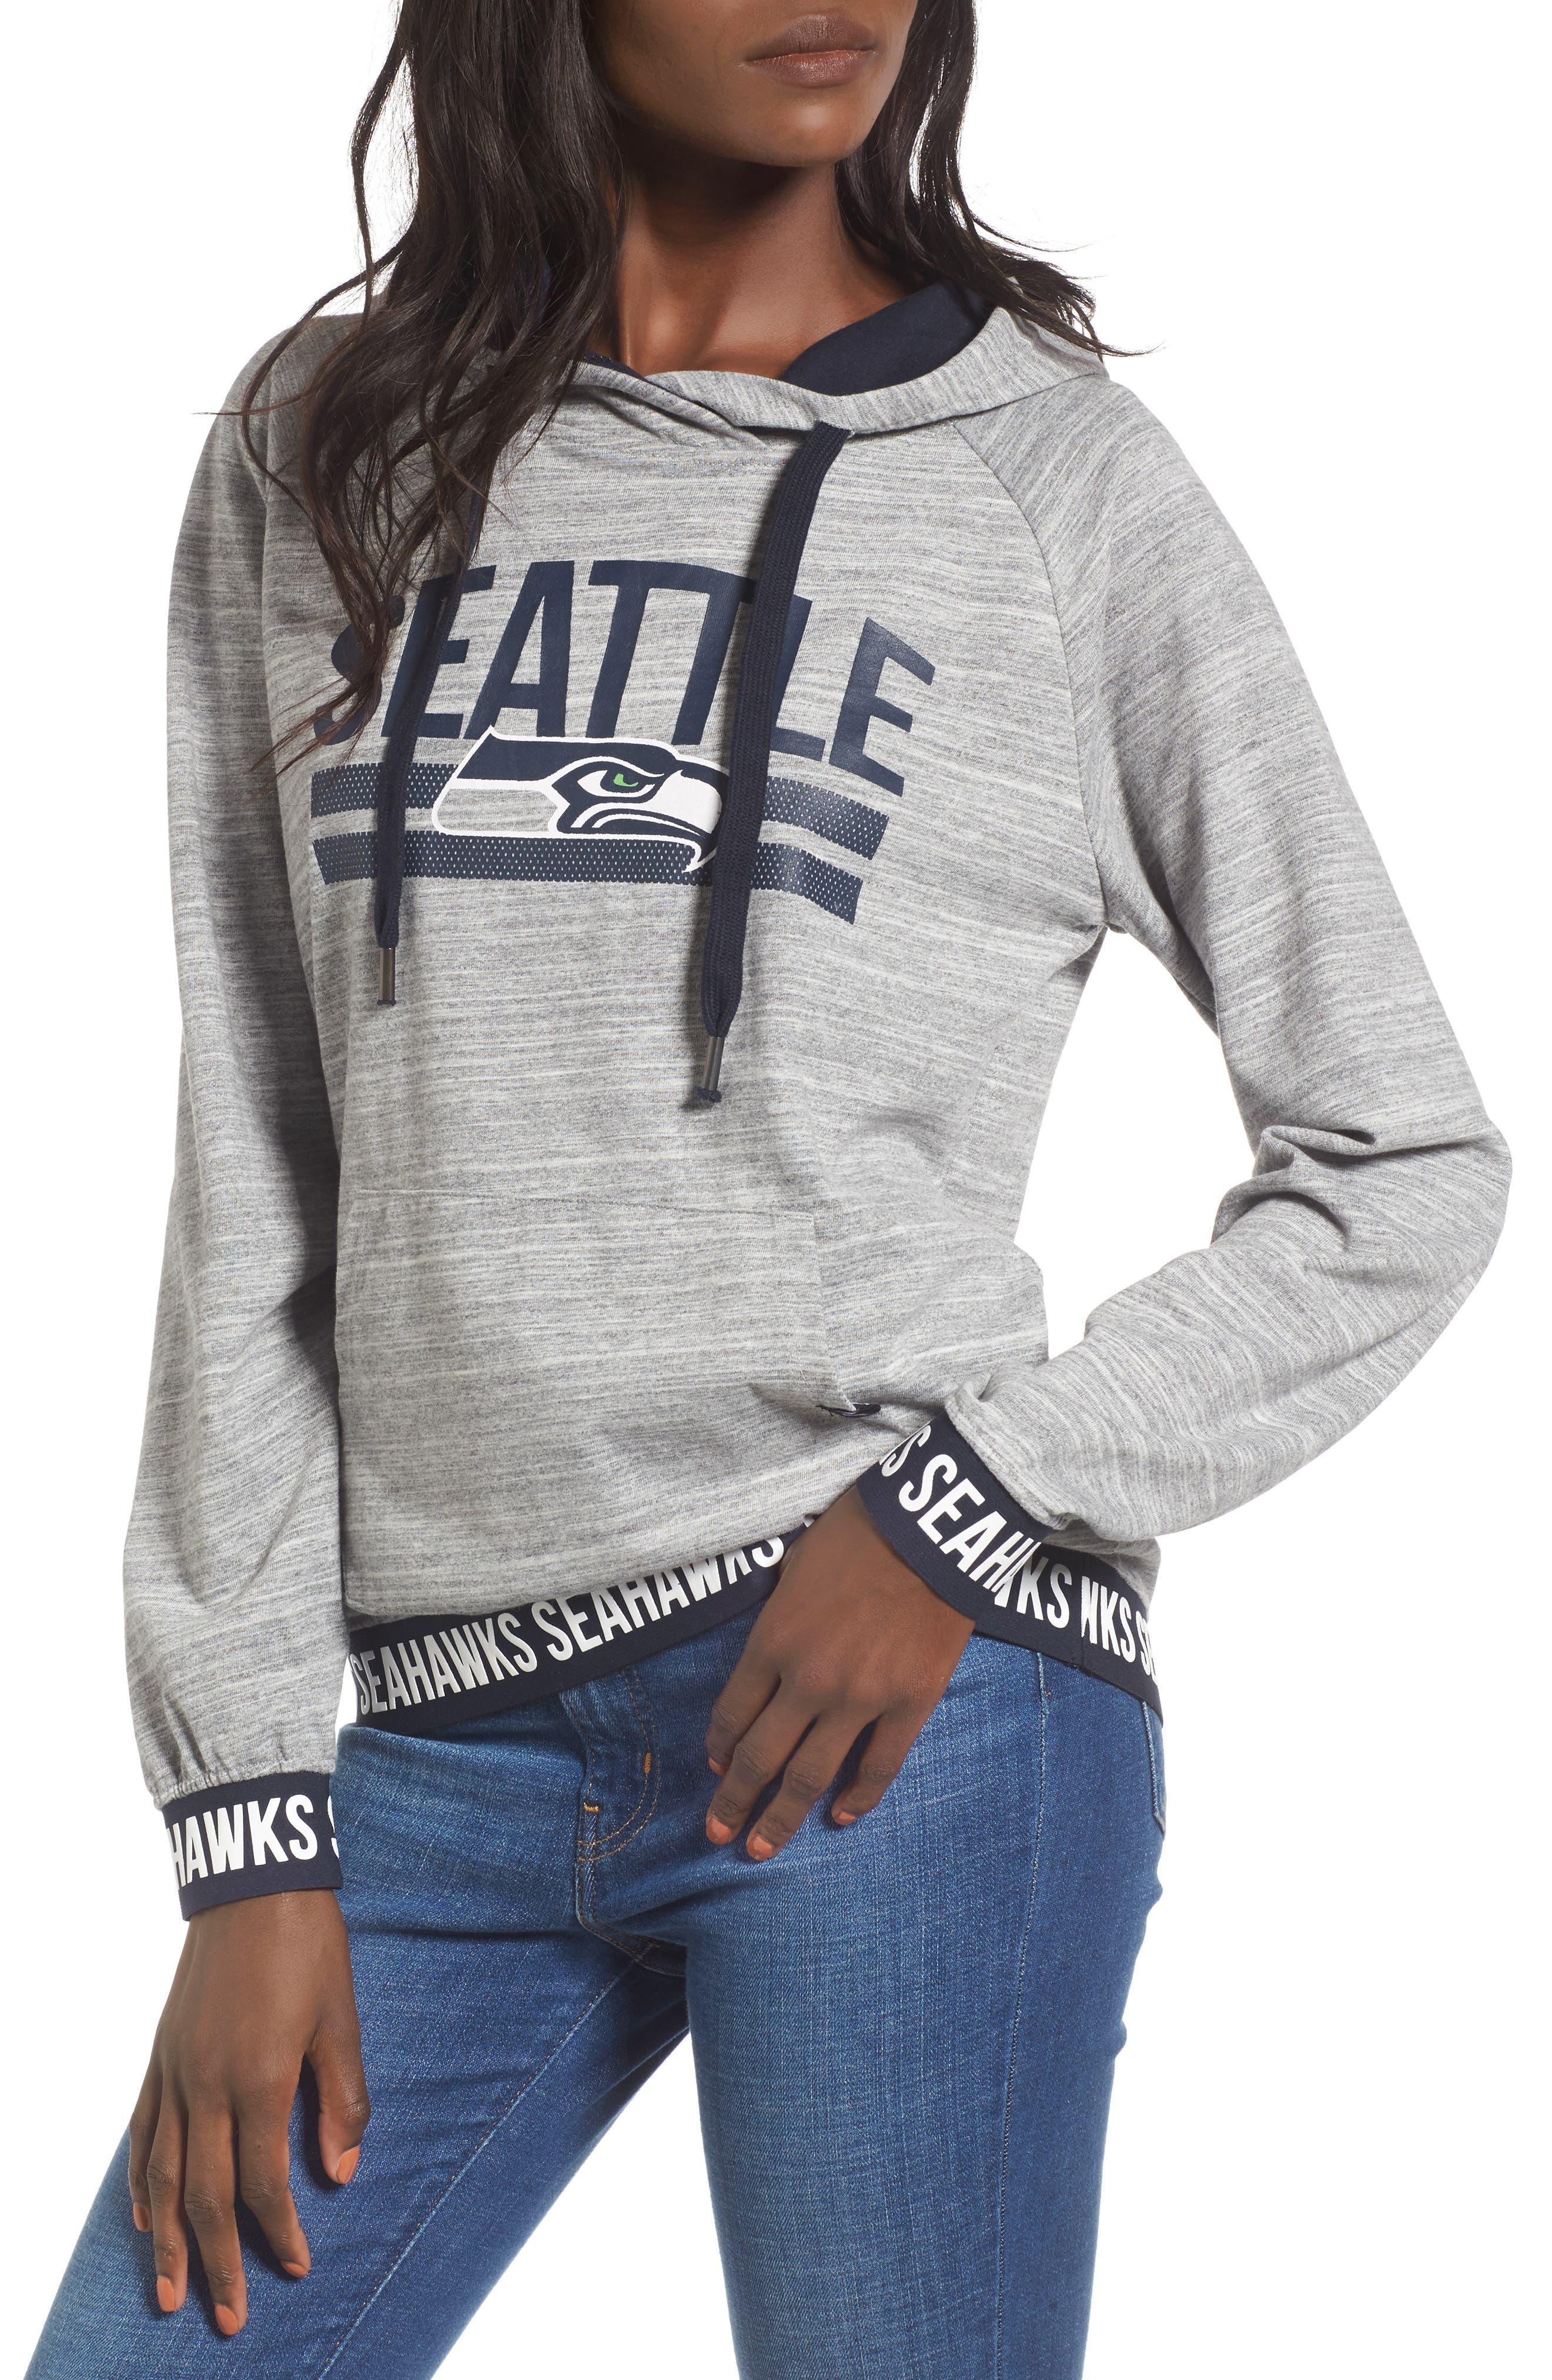 Revolve - Seattle Seahawks Hoodie,                         Main,                         color, Space Dye Grey